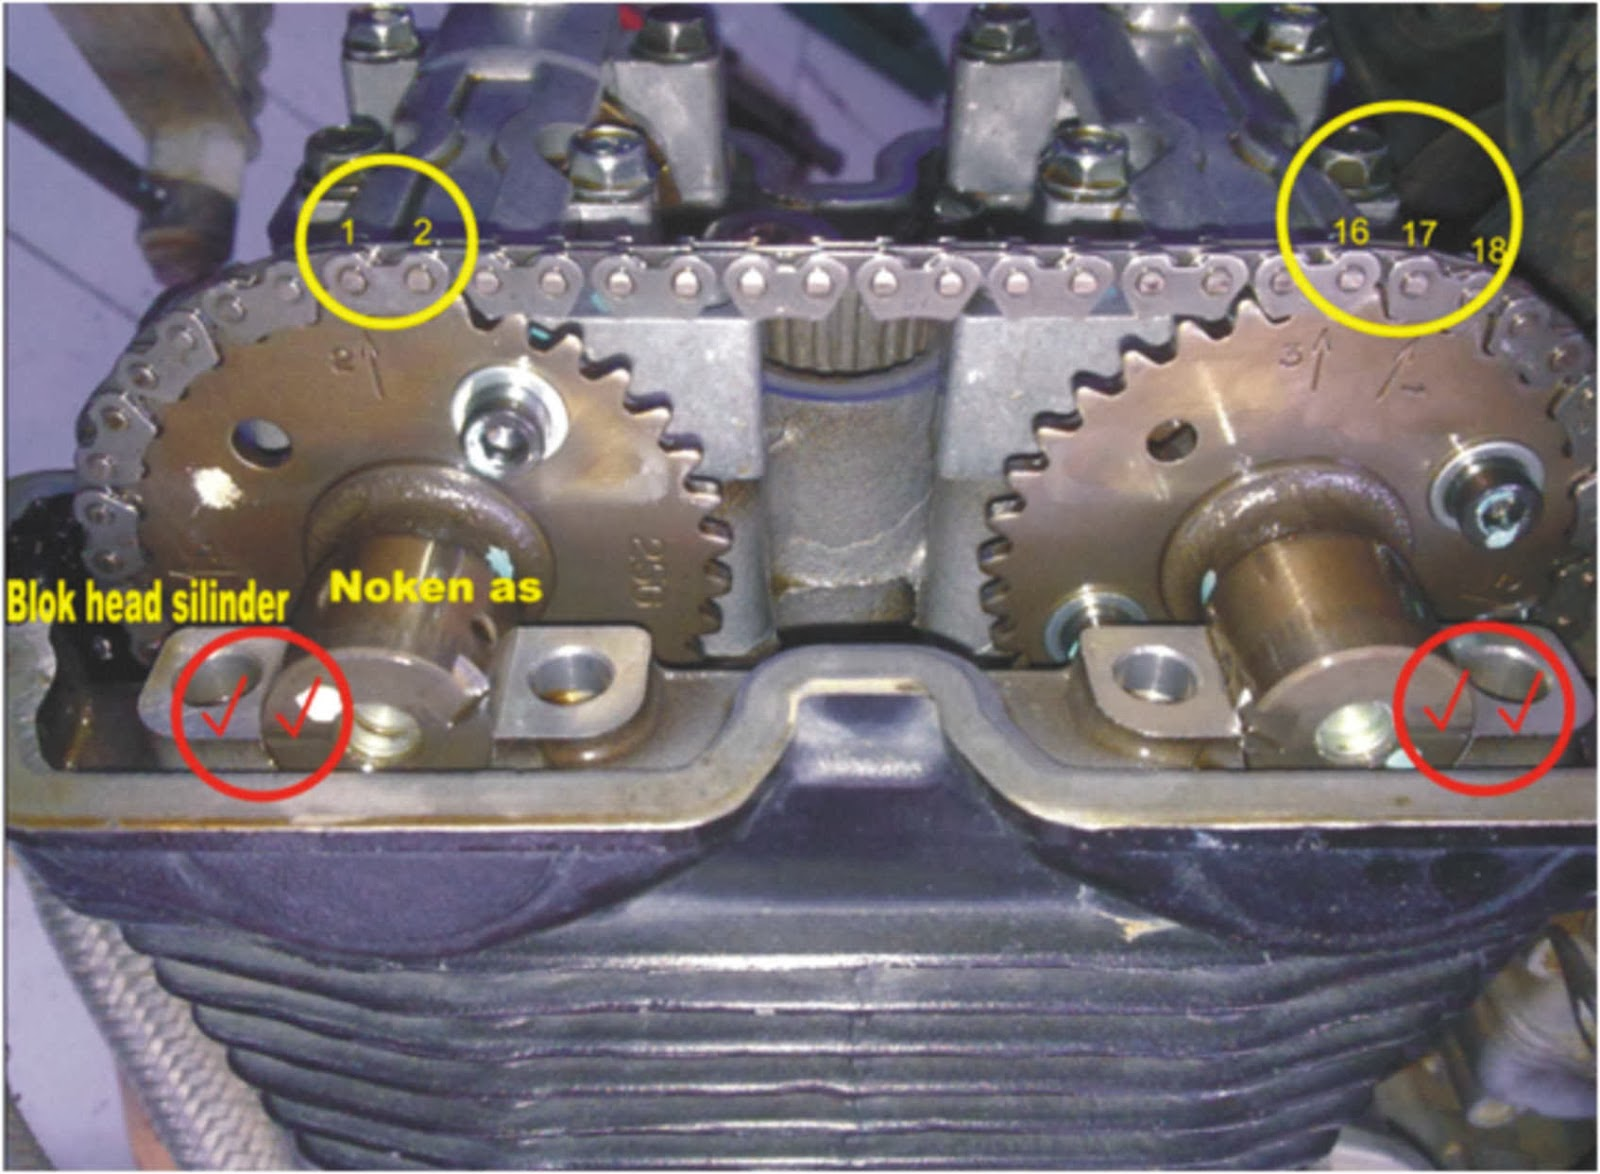 why45 motor: cara menyetel top noken as & pasang klep satria fu